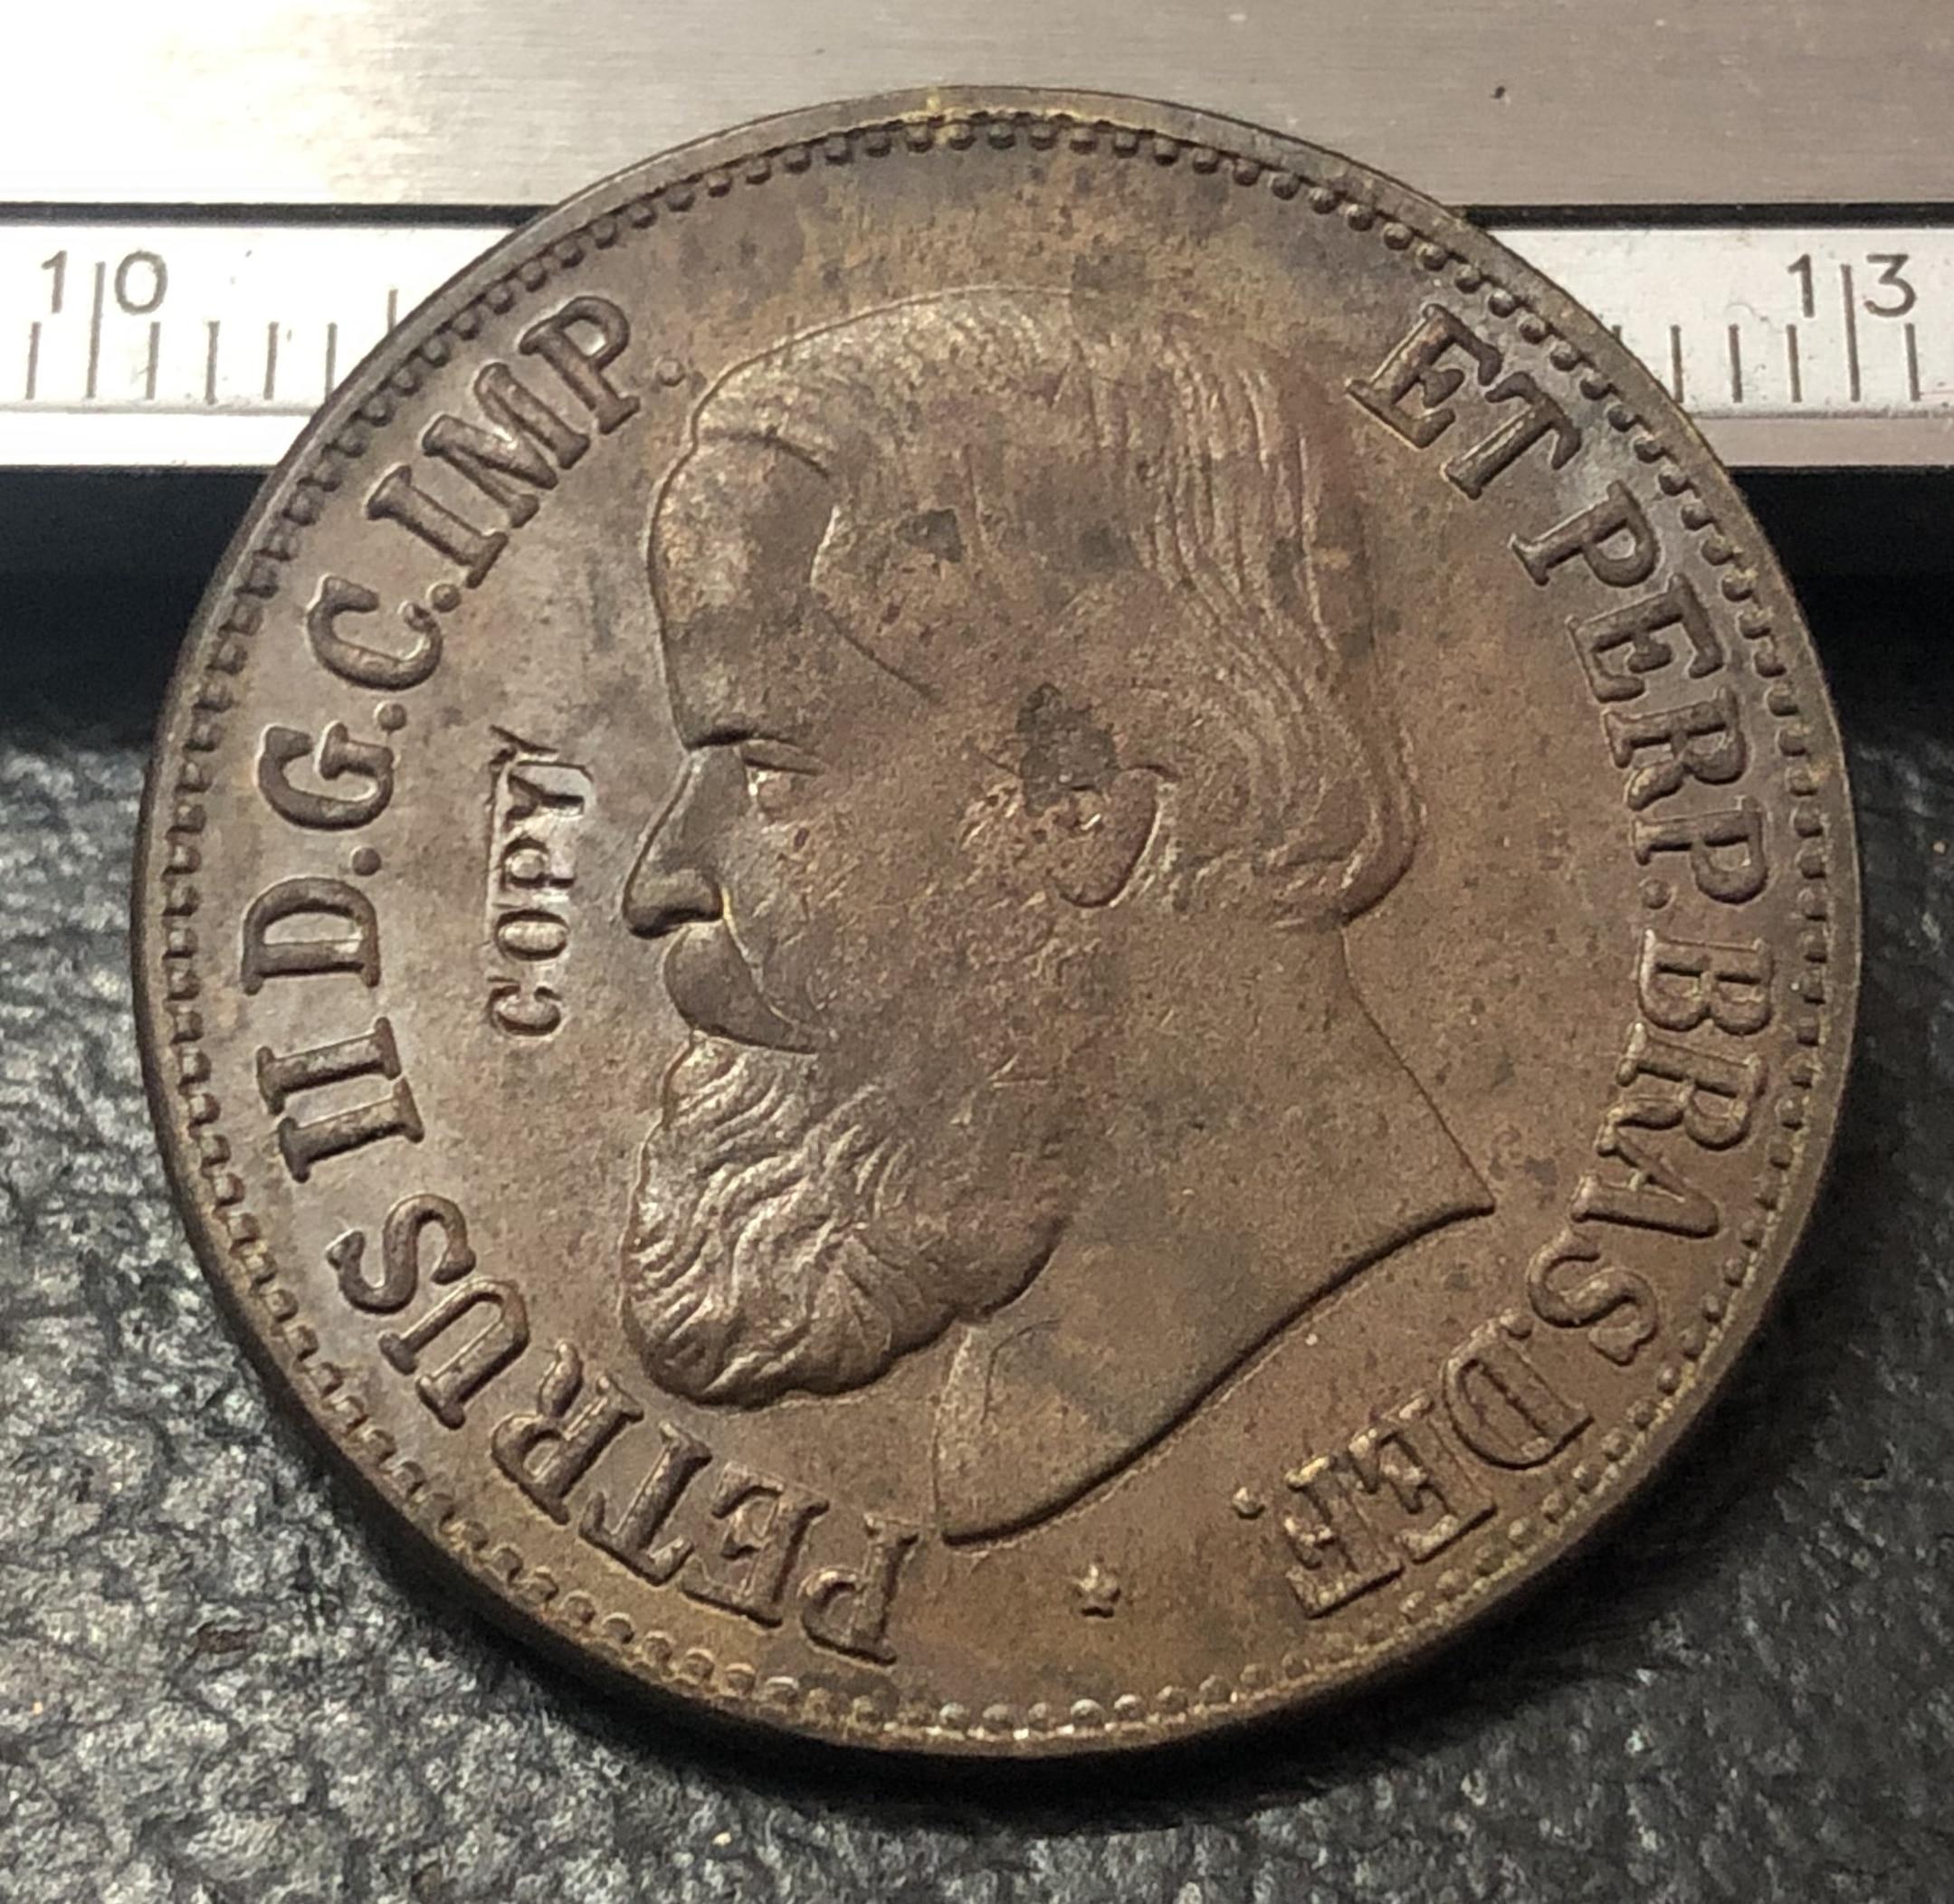 1889 бразильская медная монета copper silver coin copper coincoin magnifier   АлиЭкспресс